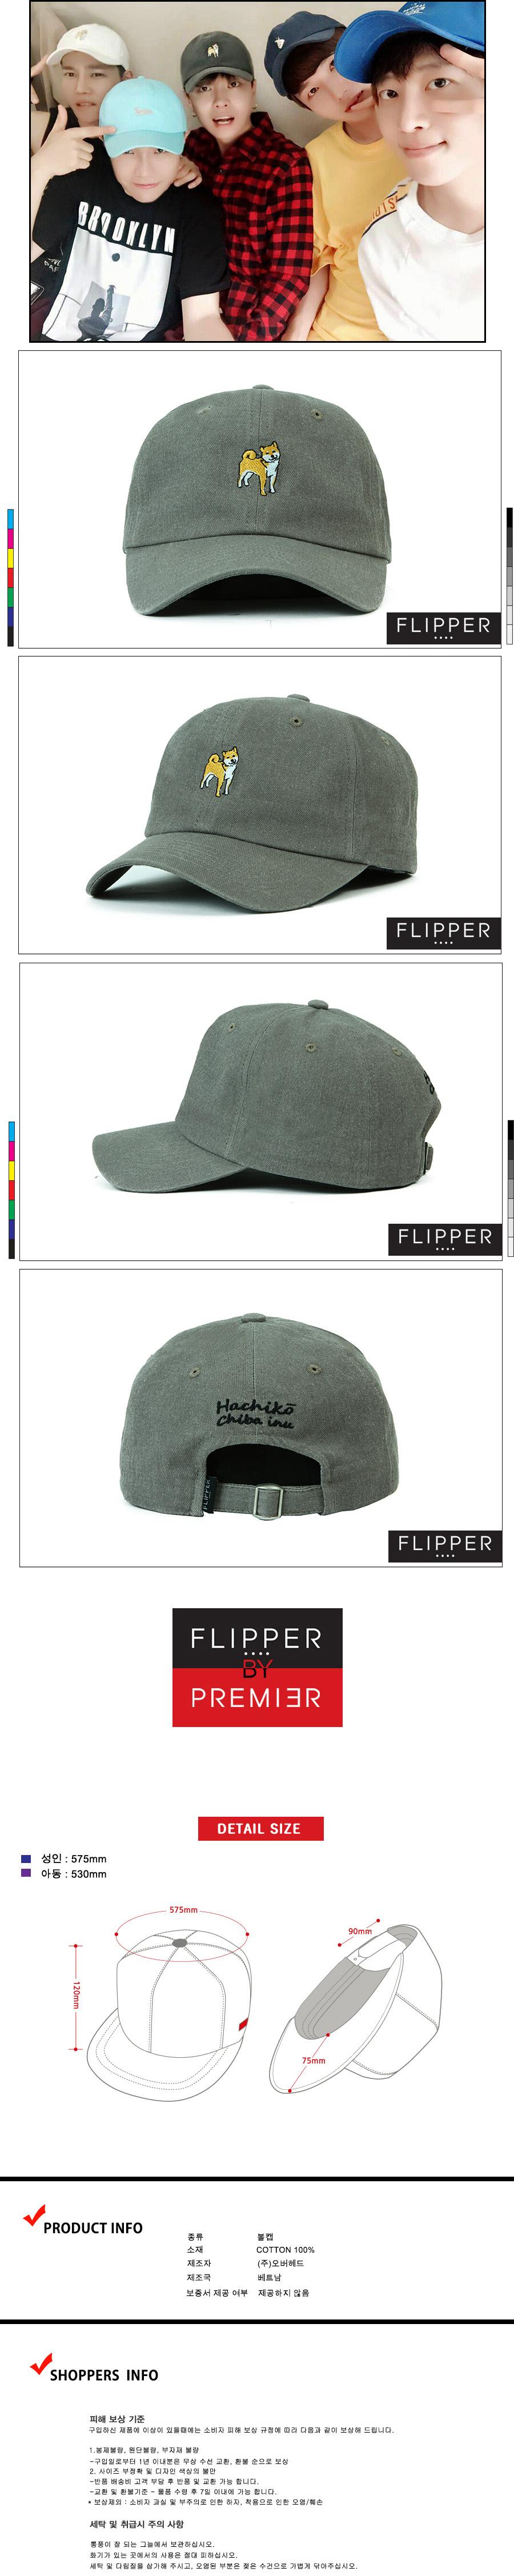 [ PREMIER ] [Premier] Flipper Ball Cap Chiba Inu Grey (FL151)